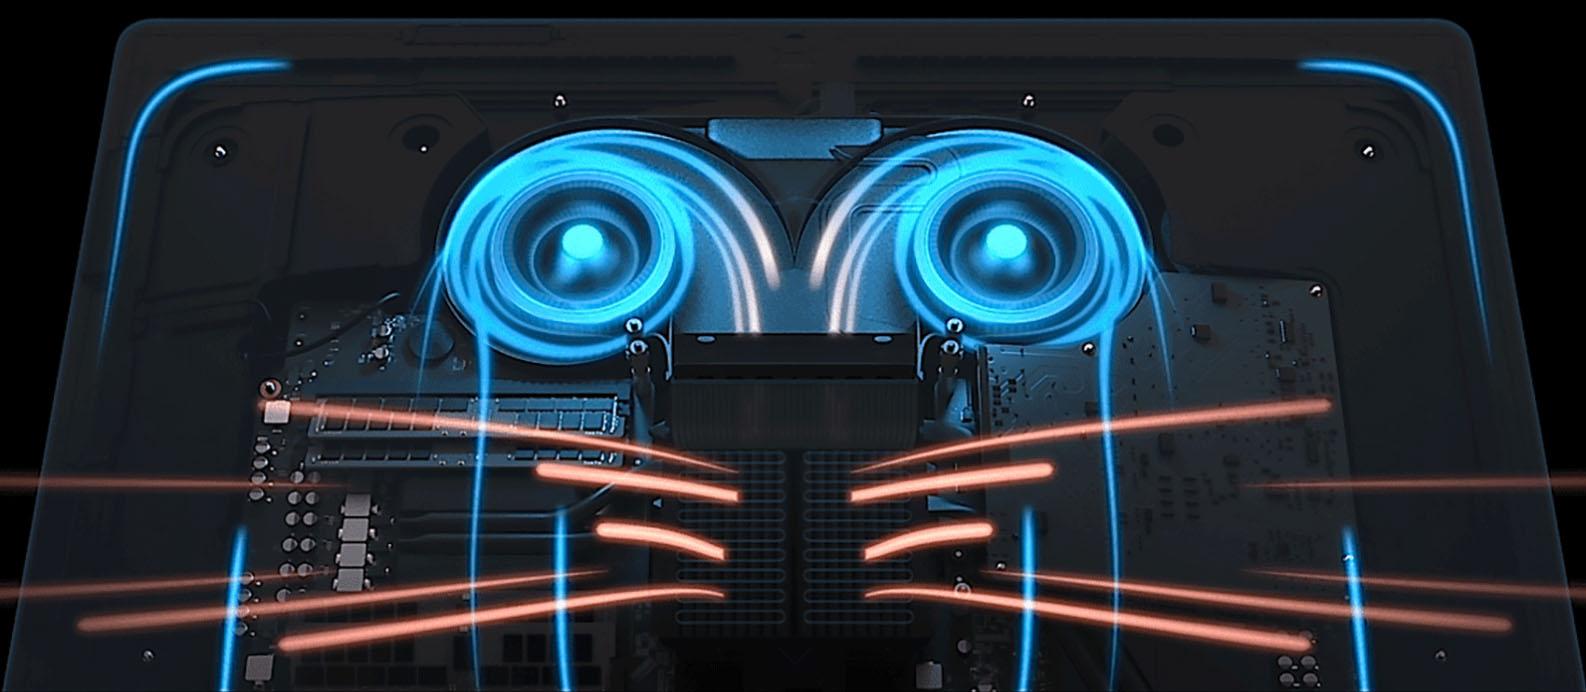 Apple Launches Latest iMac Pro With AMD's Radeon Pro RX Vega